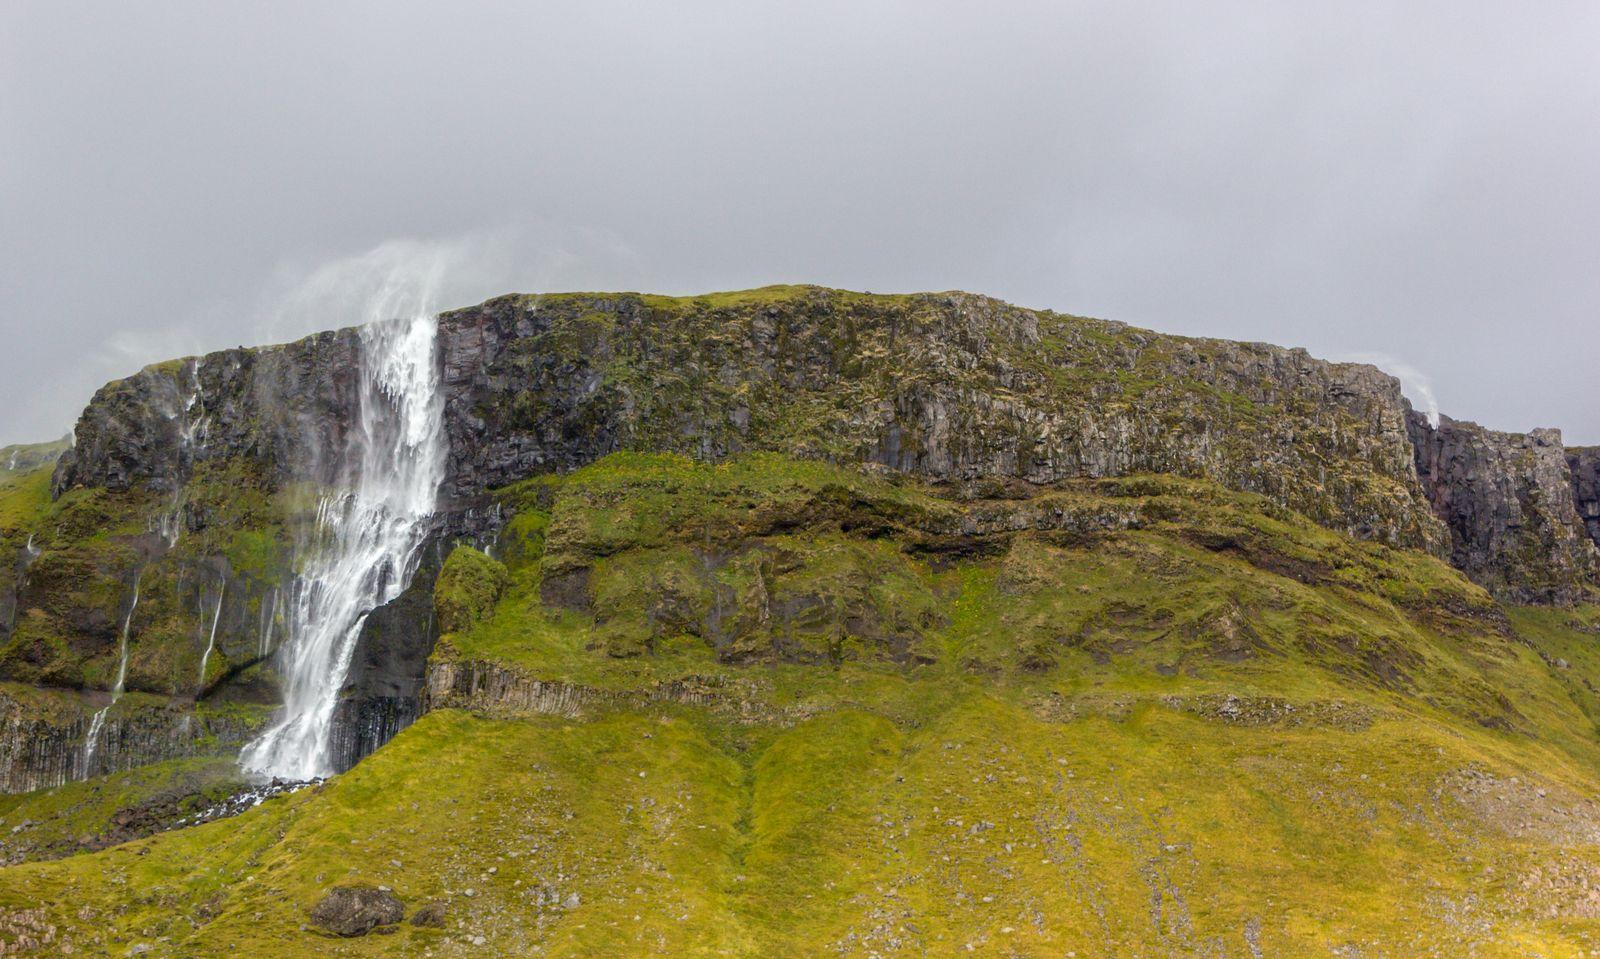 Bjarnarfoss, ahora desde abajo